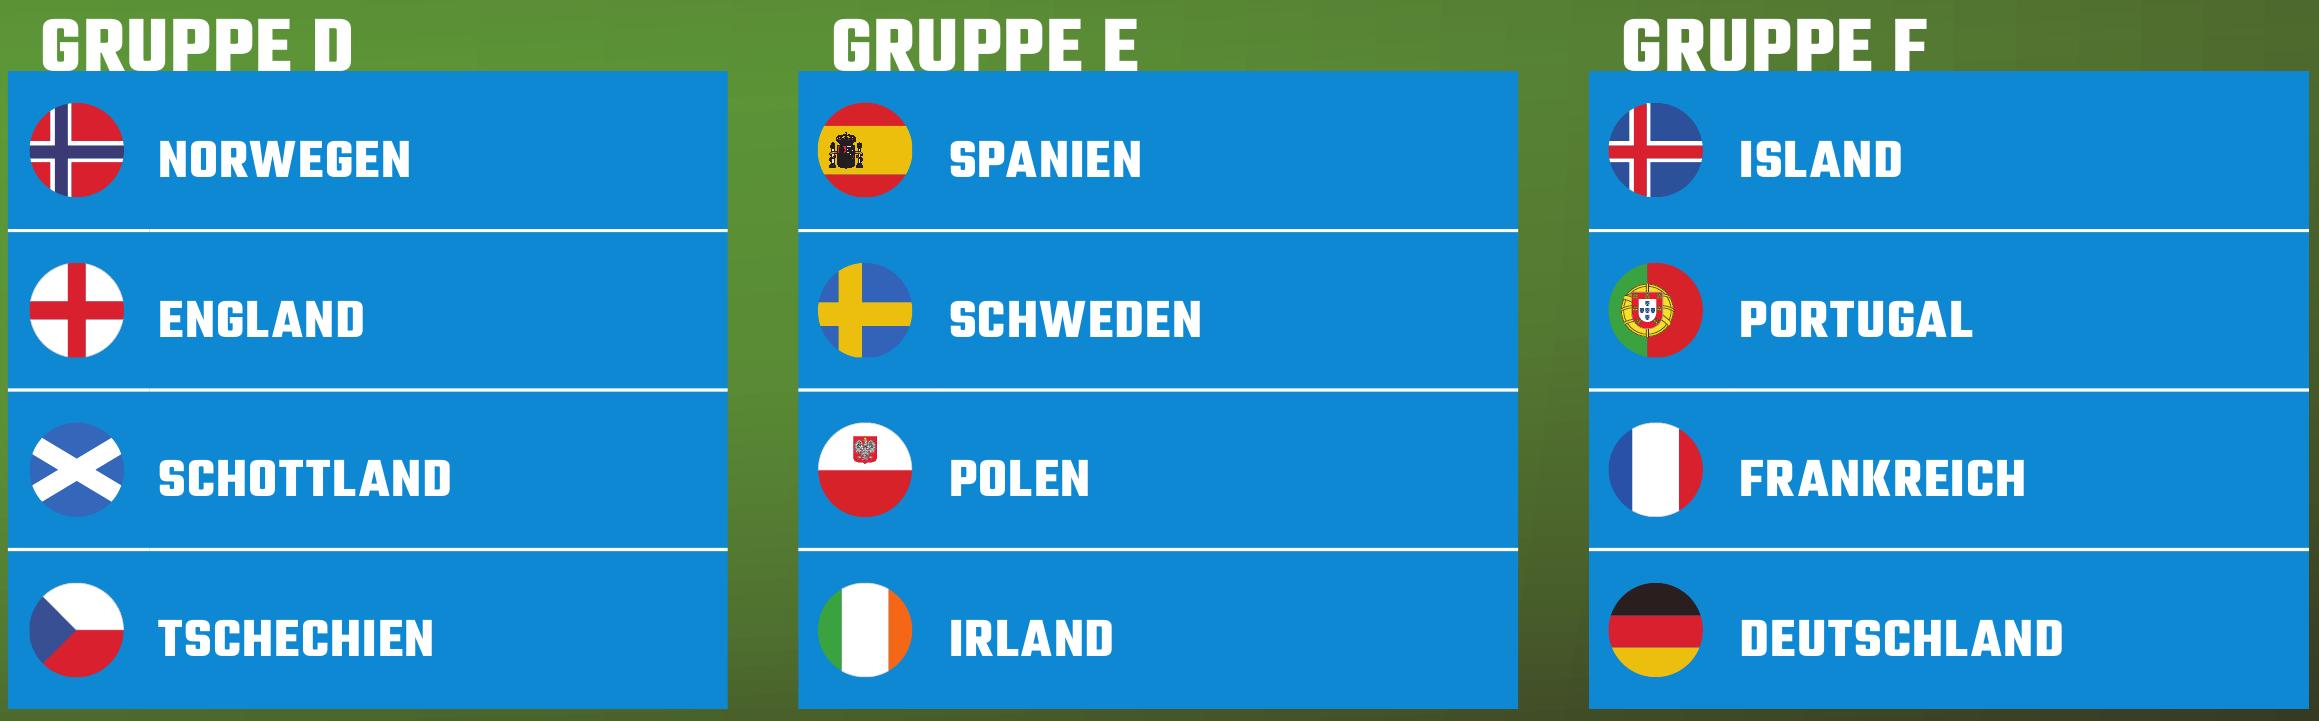 Anpfiff für den E-Soccer-Cup Image 7